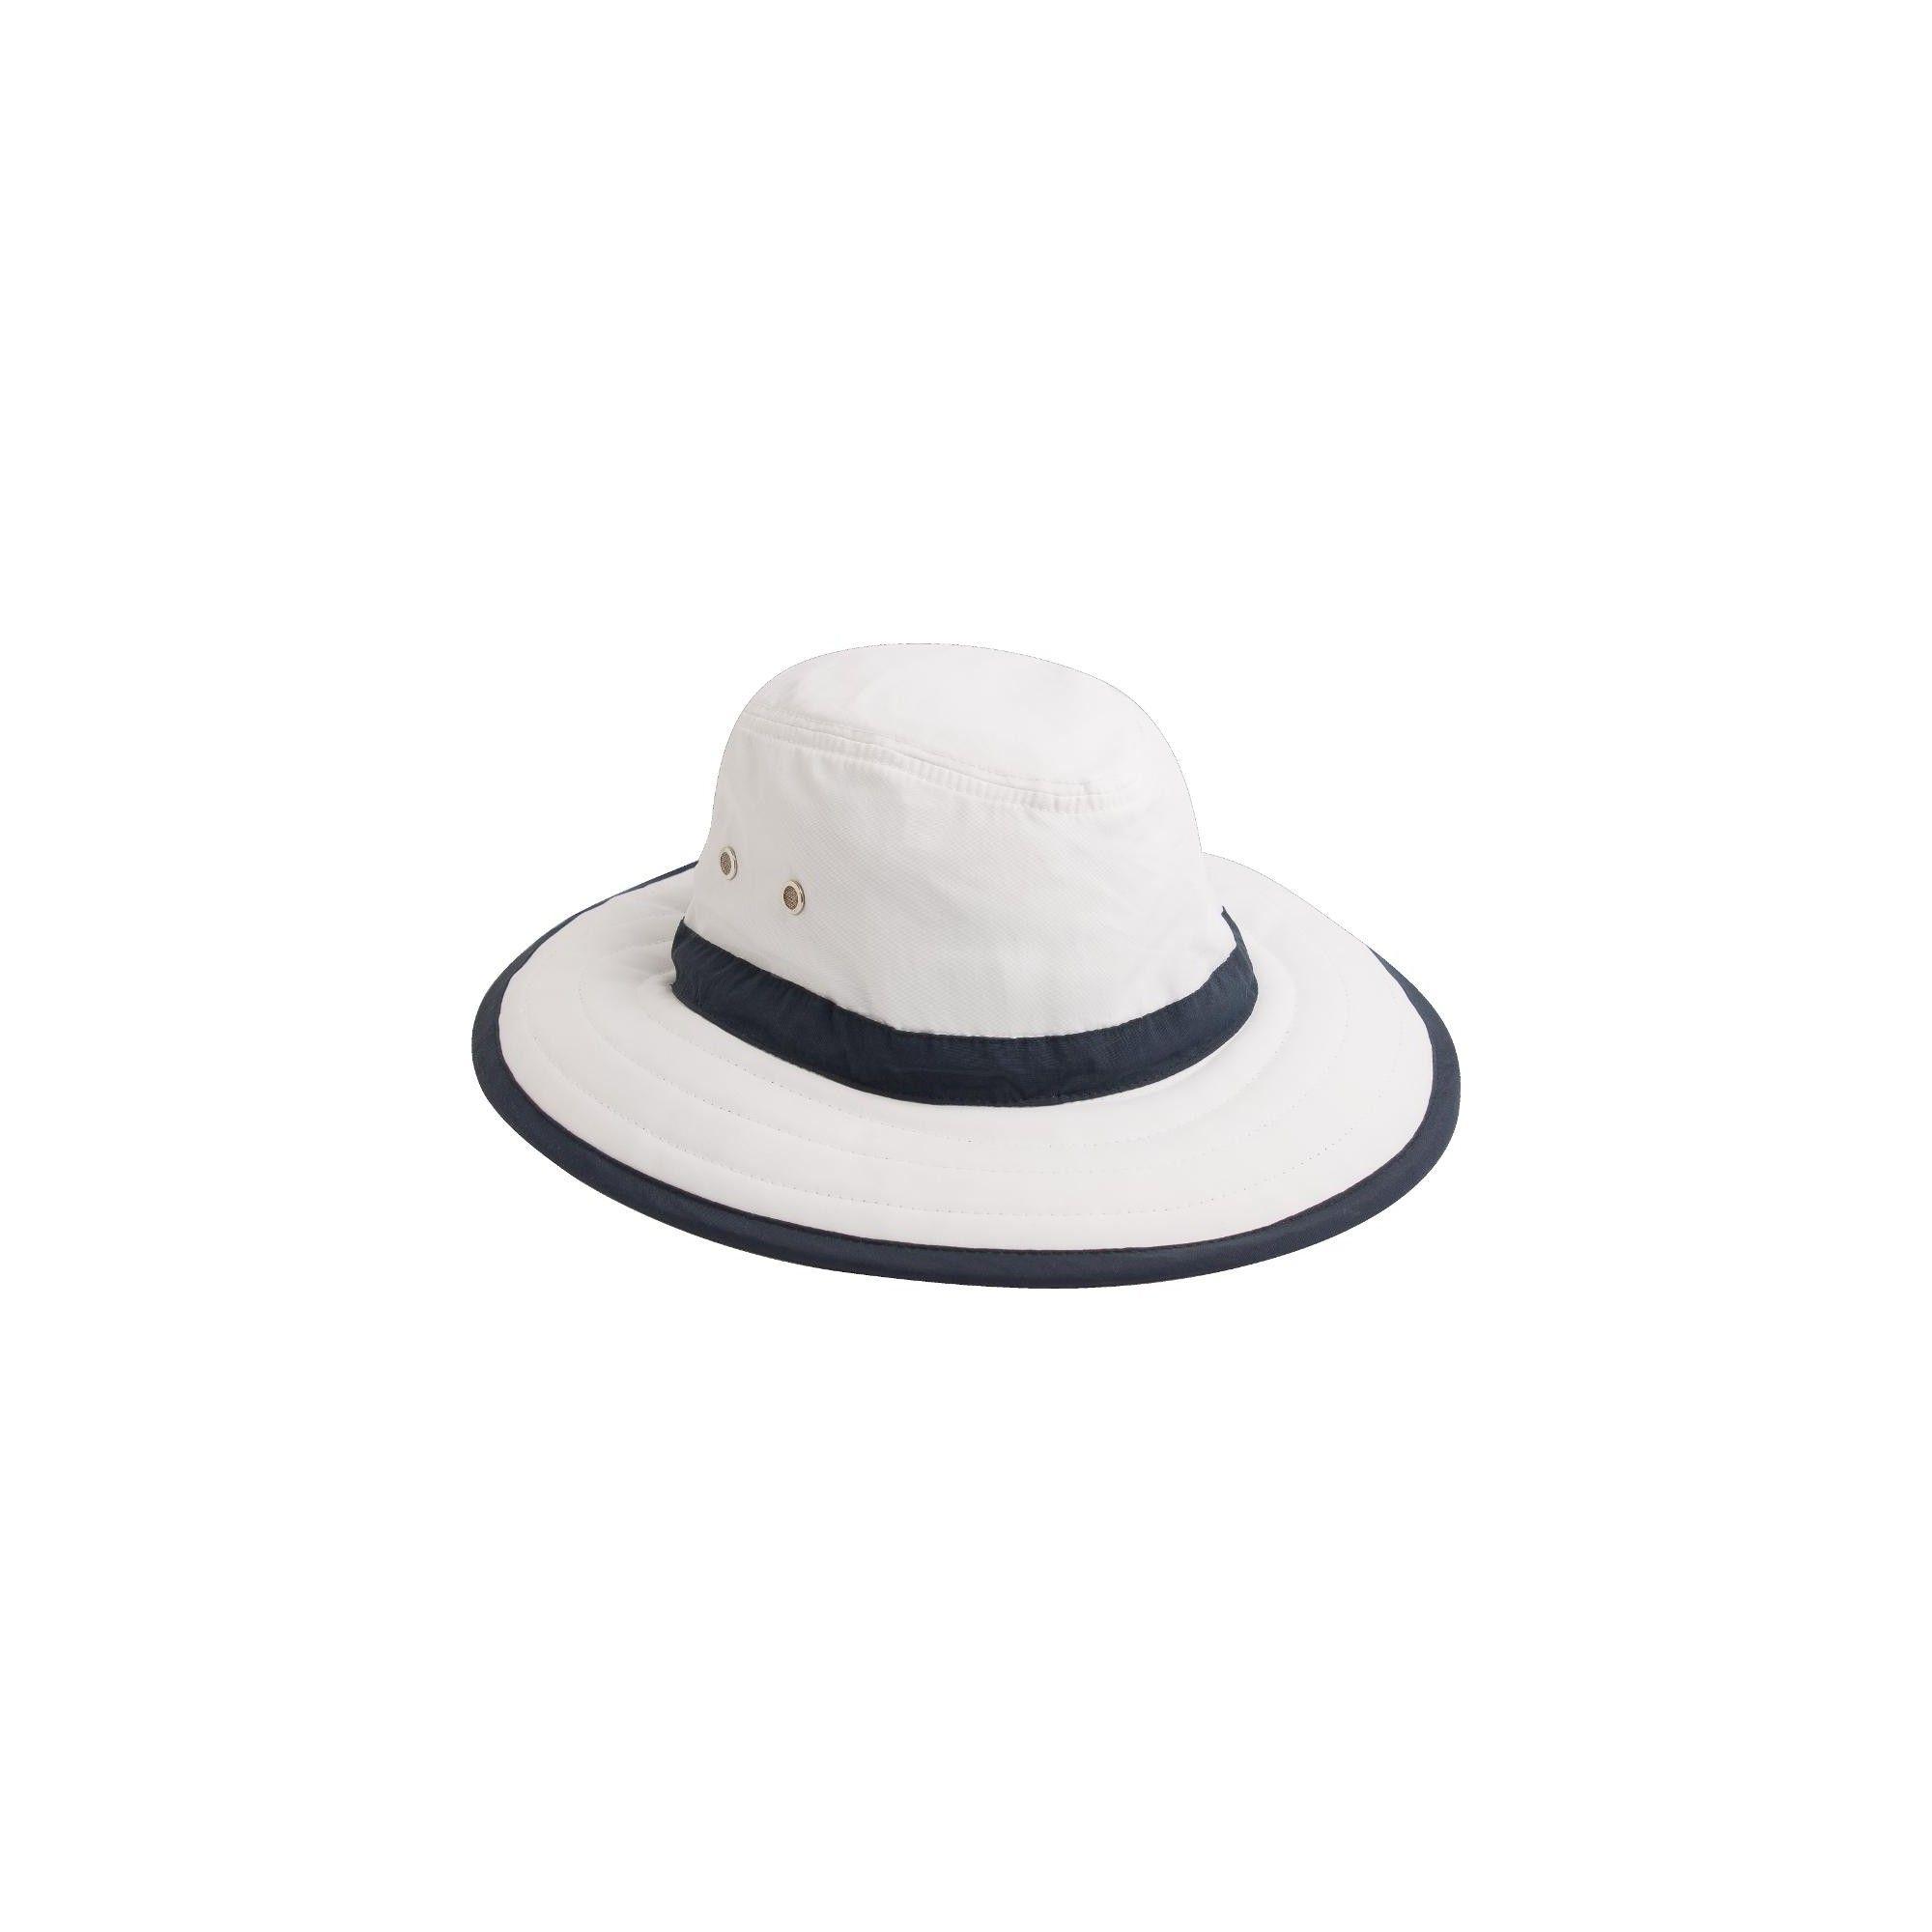 Ahead Palmer Sun Hat White Navy (White Blue) Small Medium in 2019 ... 02a80059876